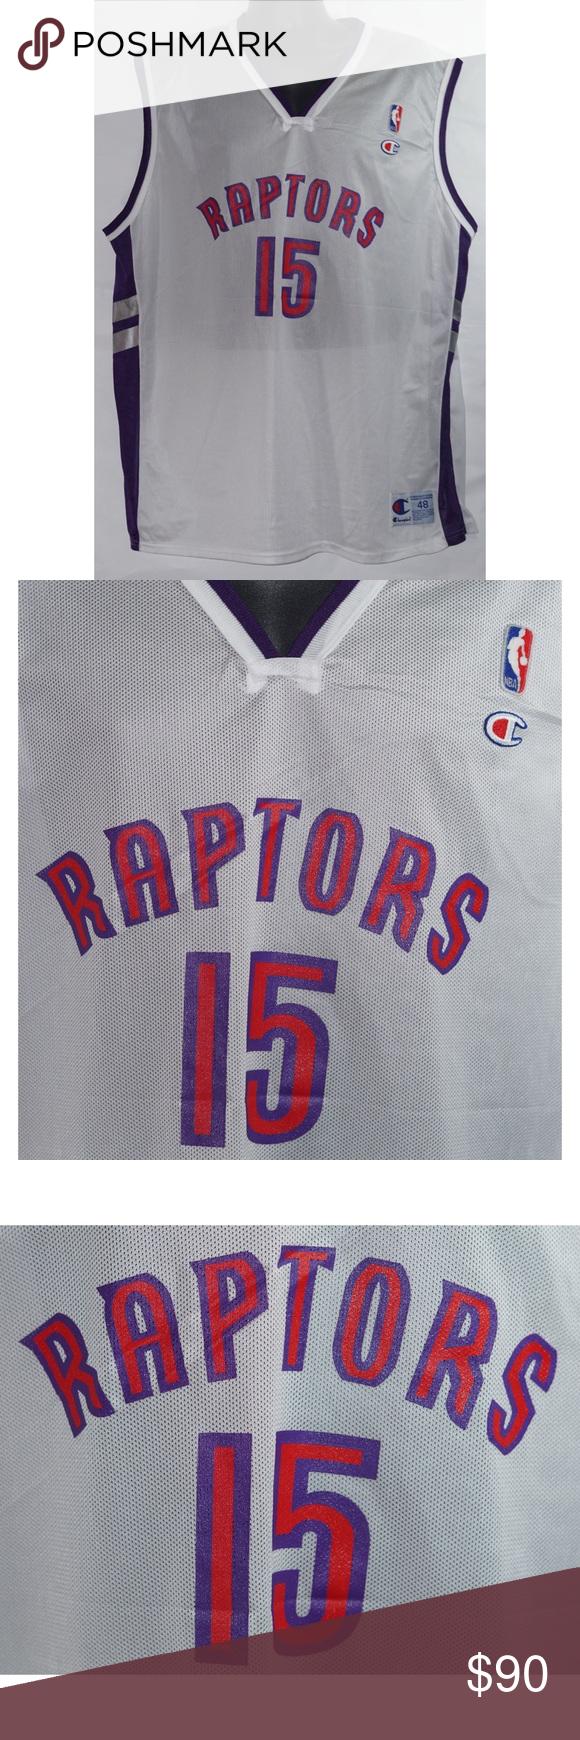 70f94e89c53 Champion Vince Carter Toronto Raptors Jersey 48 XL Champion Vince Carter  Vintage Toronto Raptors NBA Jersey Size 48 XL Champion Shirts Tank Tops